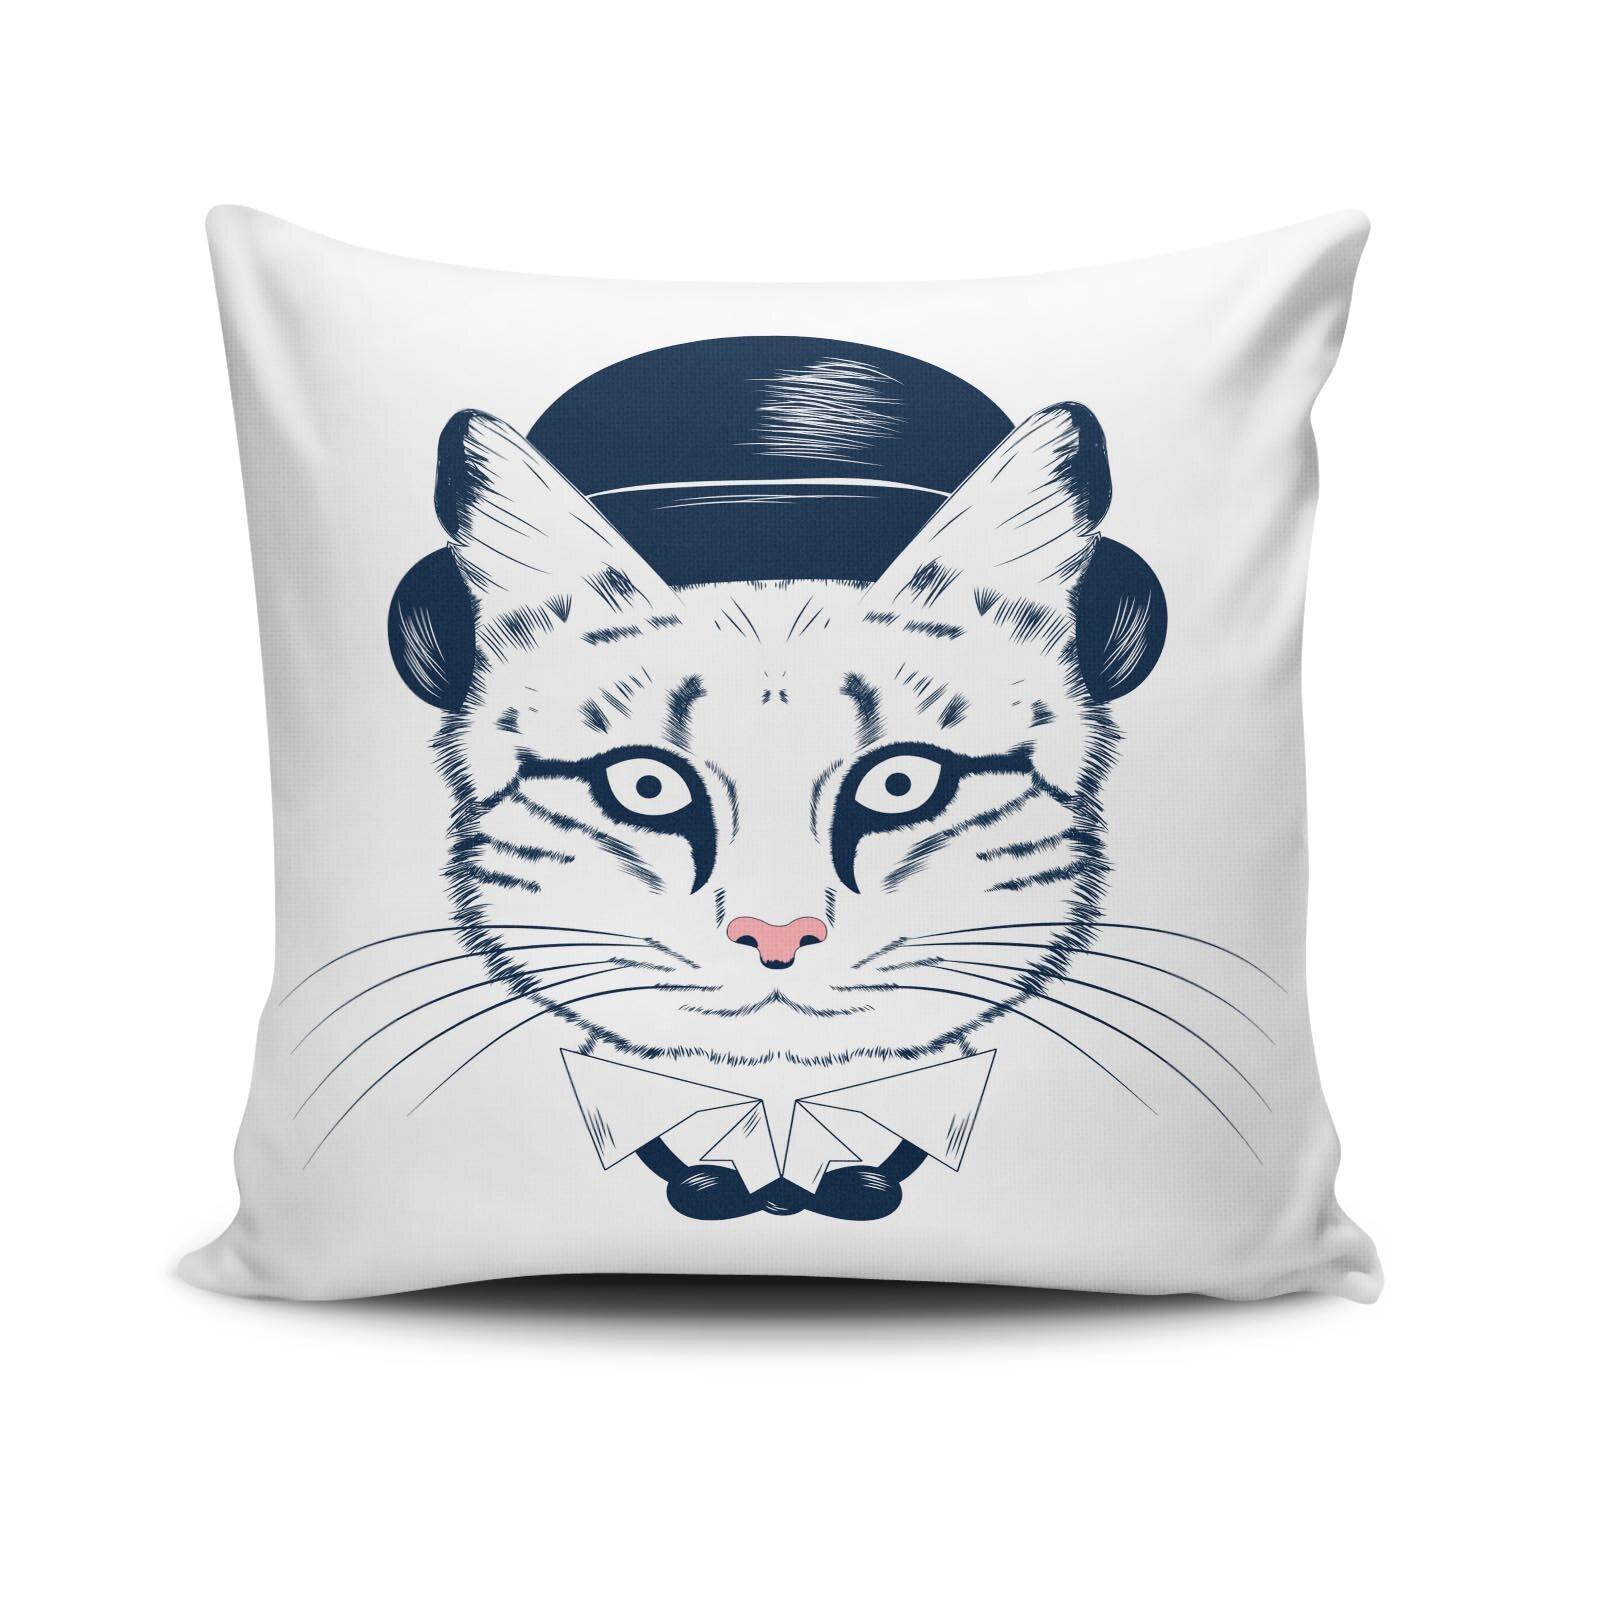 Perna decorativa Cushion Love, Dimensiune: 45 x 45 cm, Material exterior: 50% bumbac / 50% poliester 768CLV0302